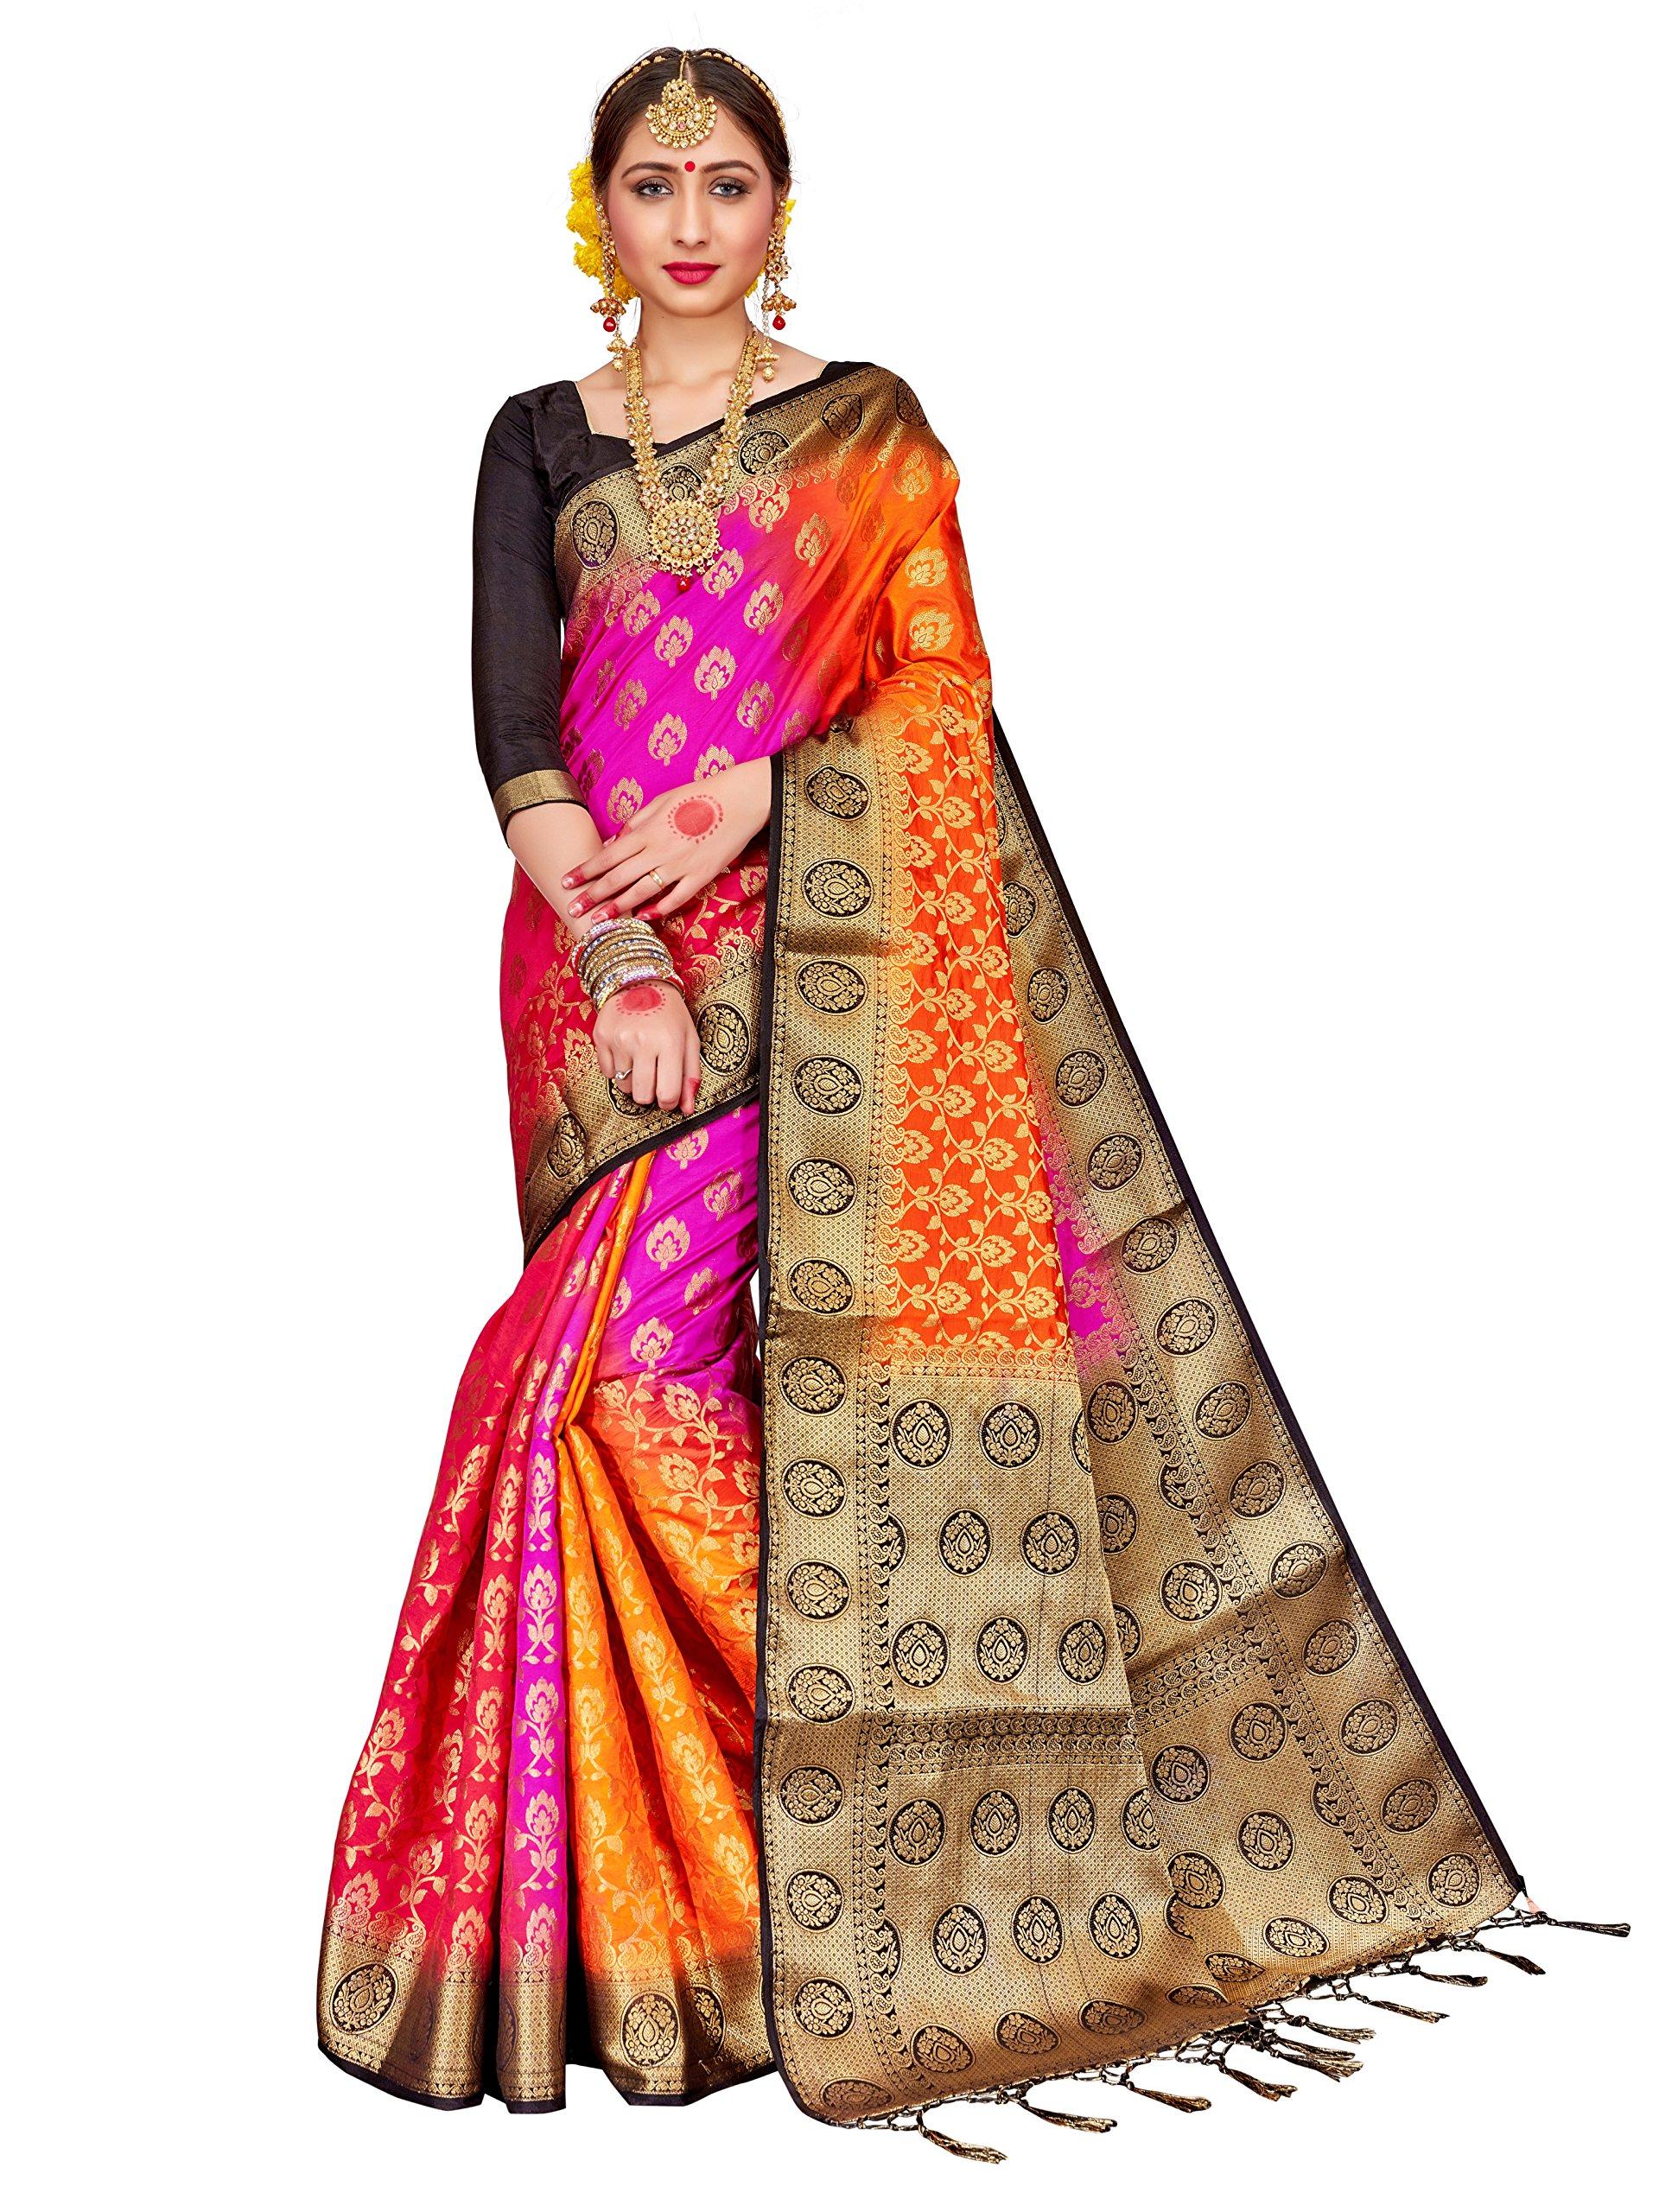 ELINA FASHION Sarees Women Banarasi Art Silk Woven Work Saree l Indian Wedding Ethnic Sari & Blouse Piece (Multi 3)